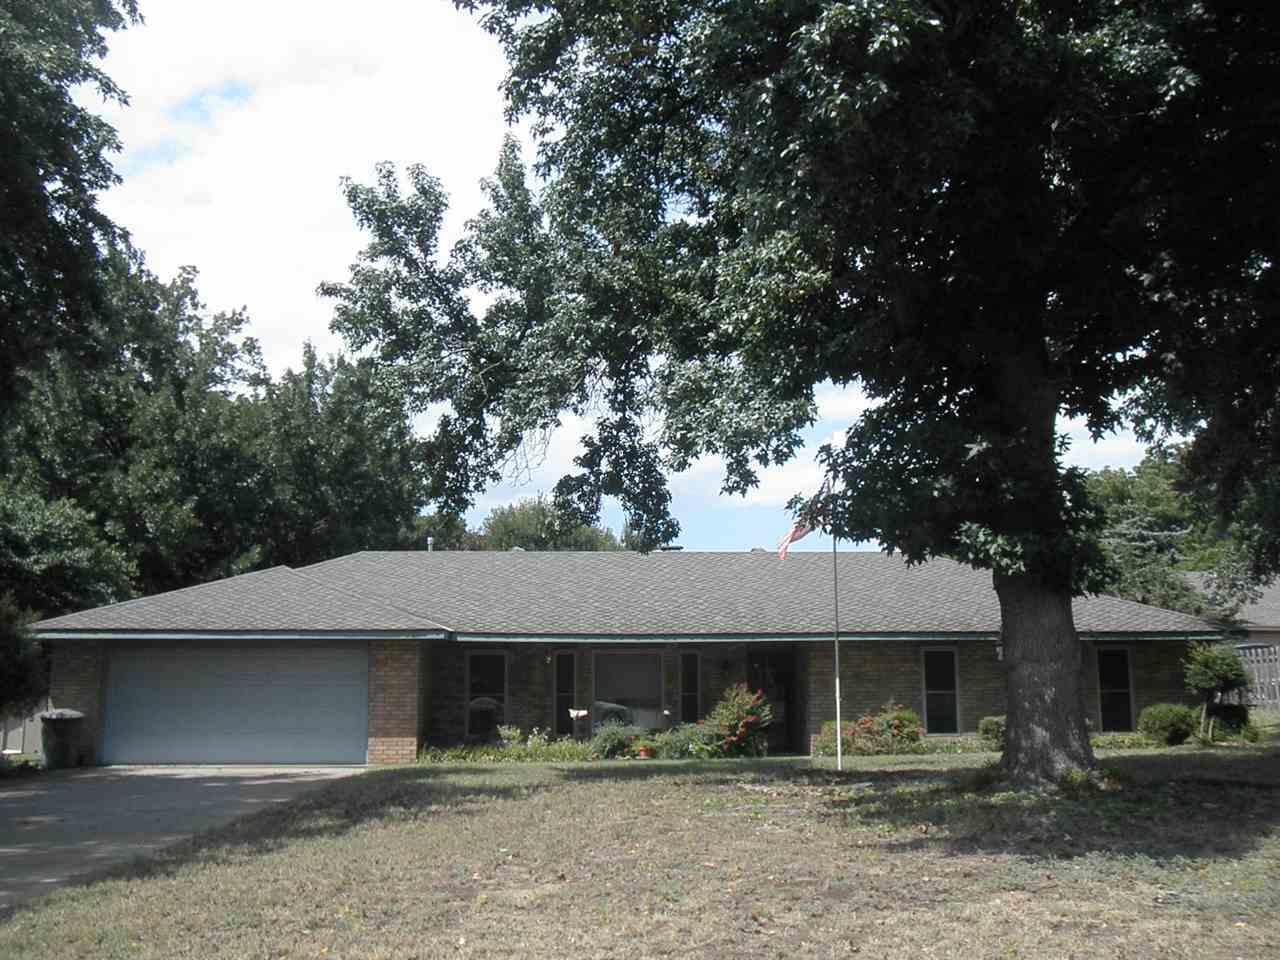 Sold Intraoffice W/MLS | 7 Raintree Ponca City, OK 74604 0